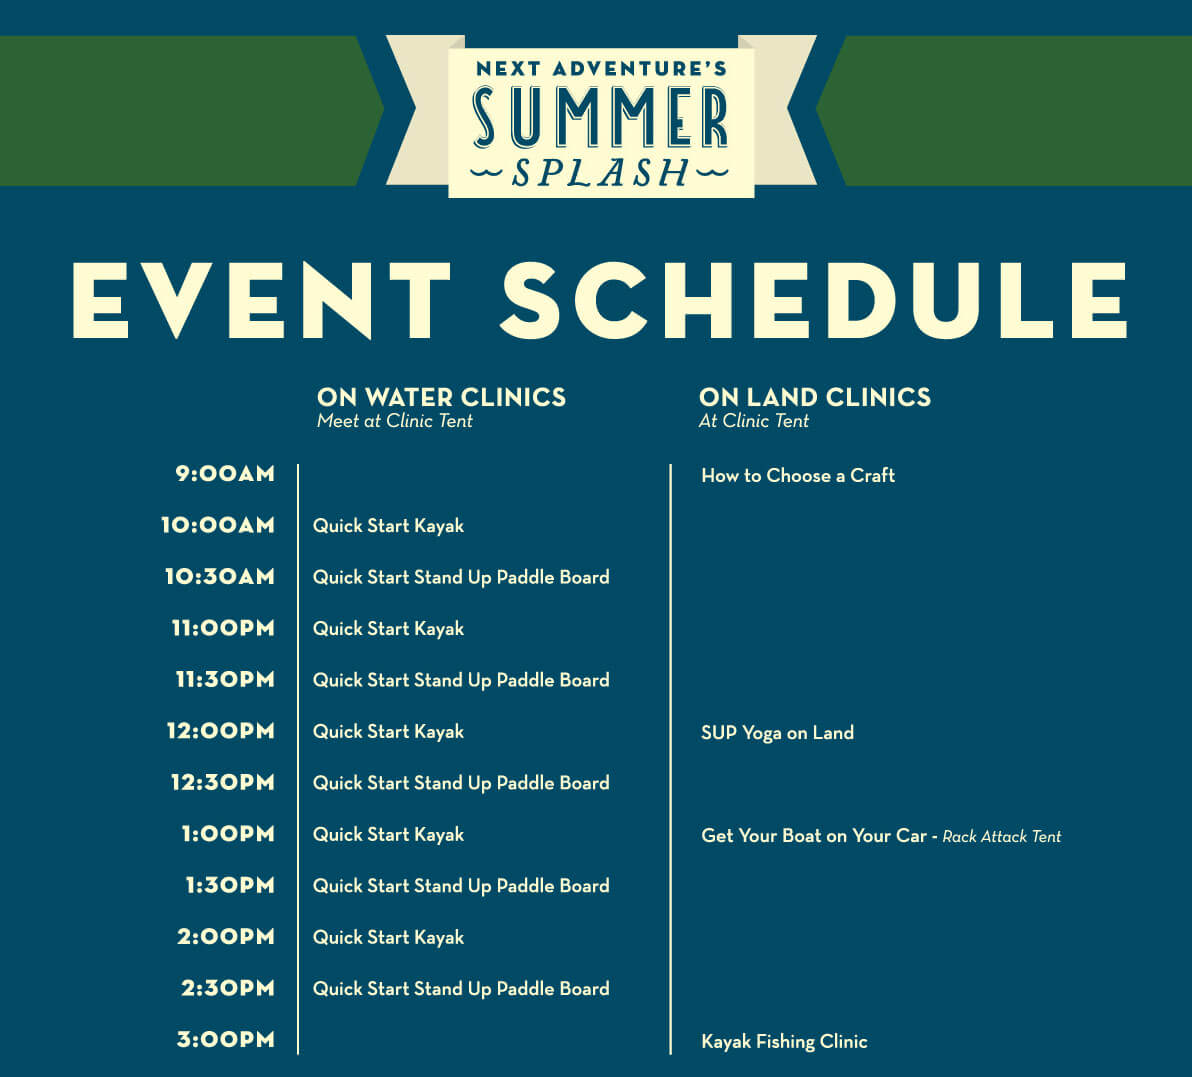 Summer Splash clinics